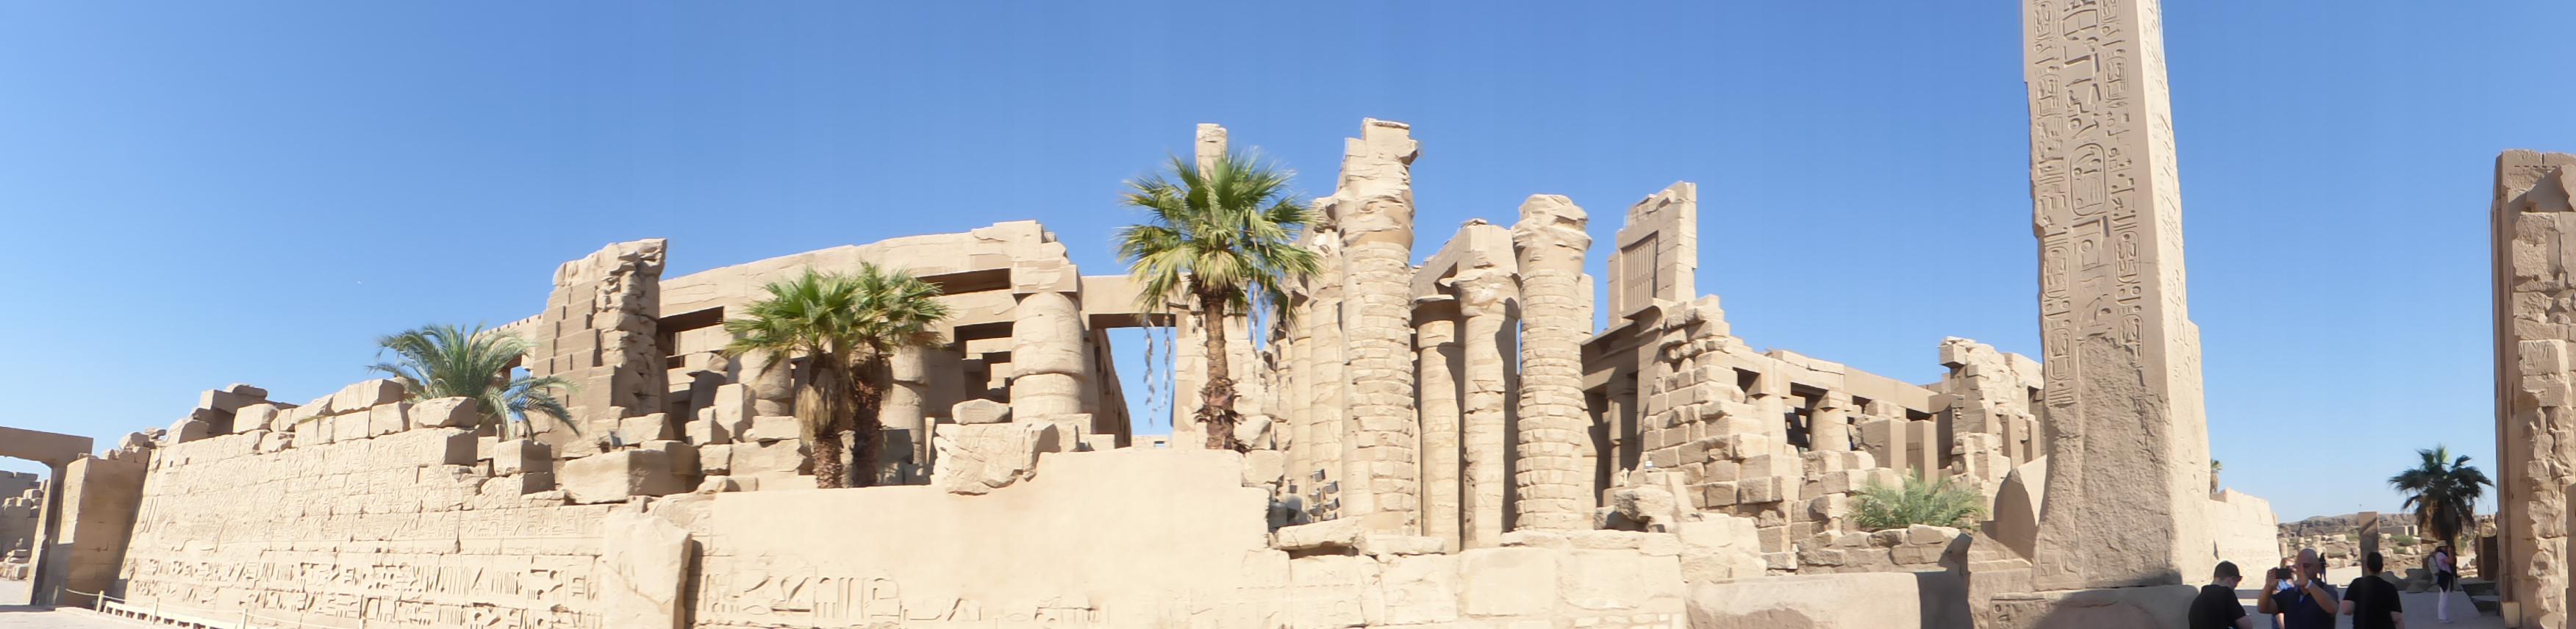 Panorama-Ägypten (10)